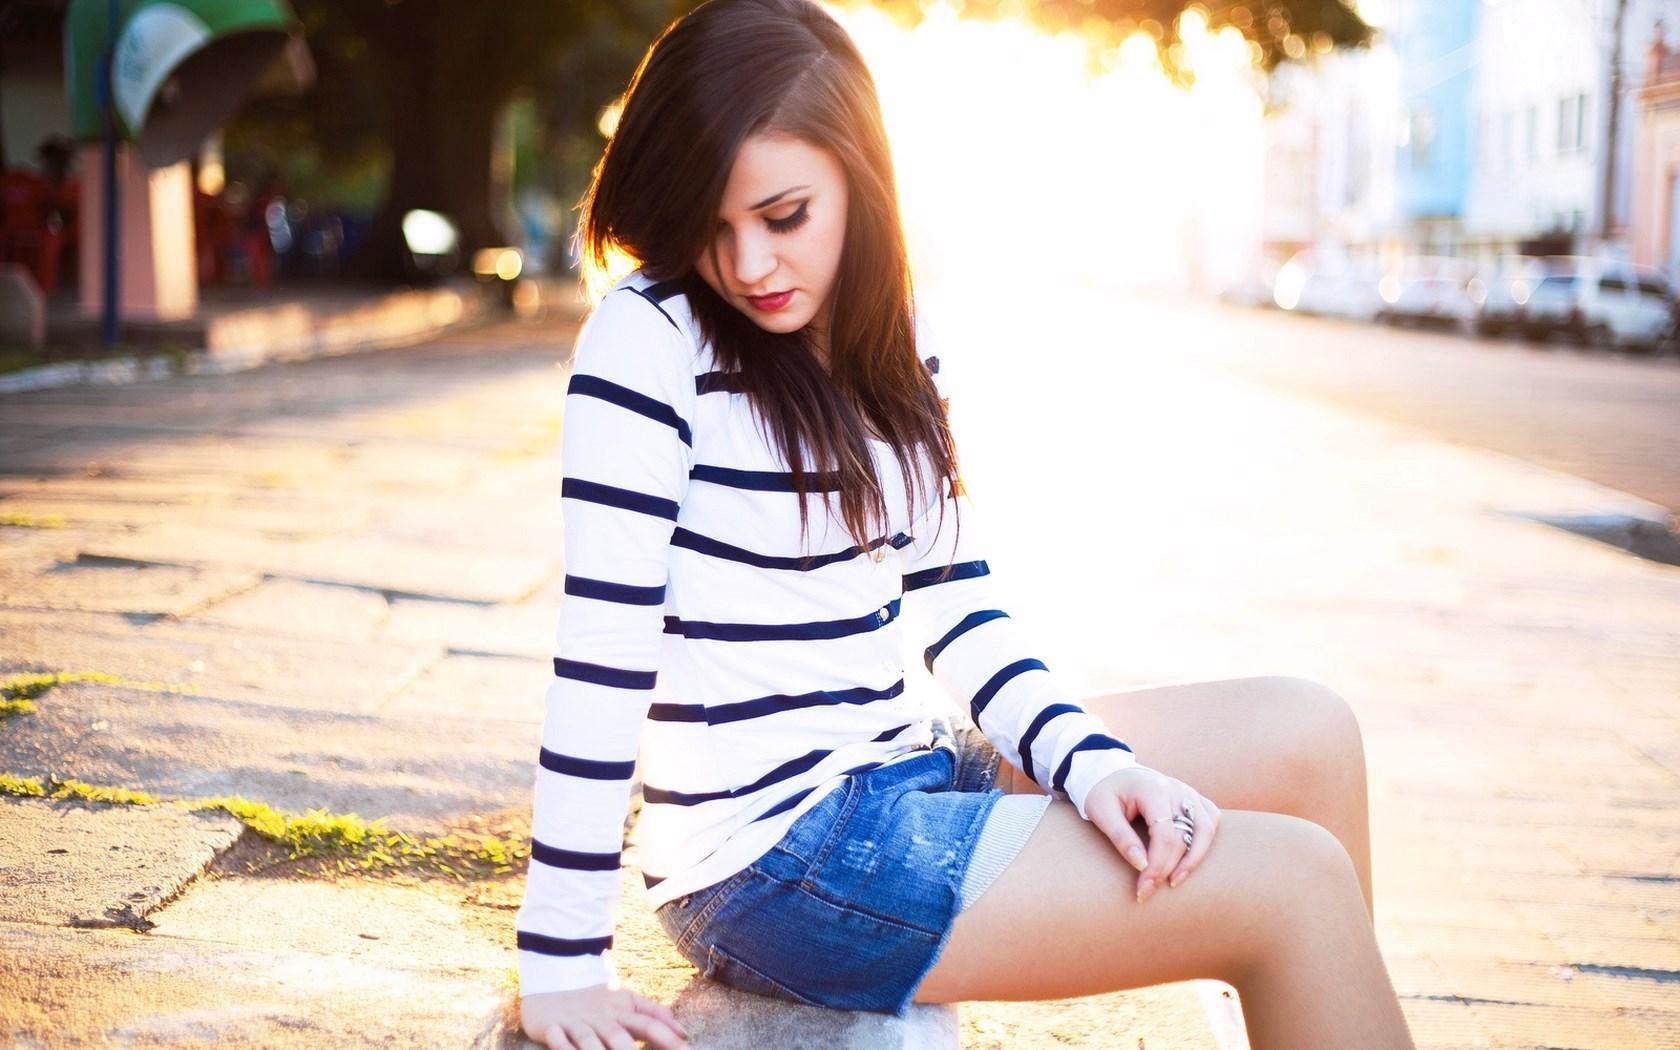 City Brunette Girl Blue Jeans Sweater HD Wallpaper